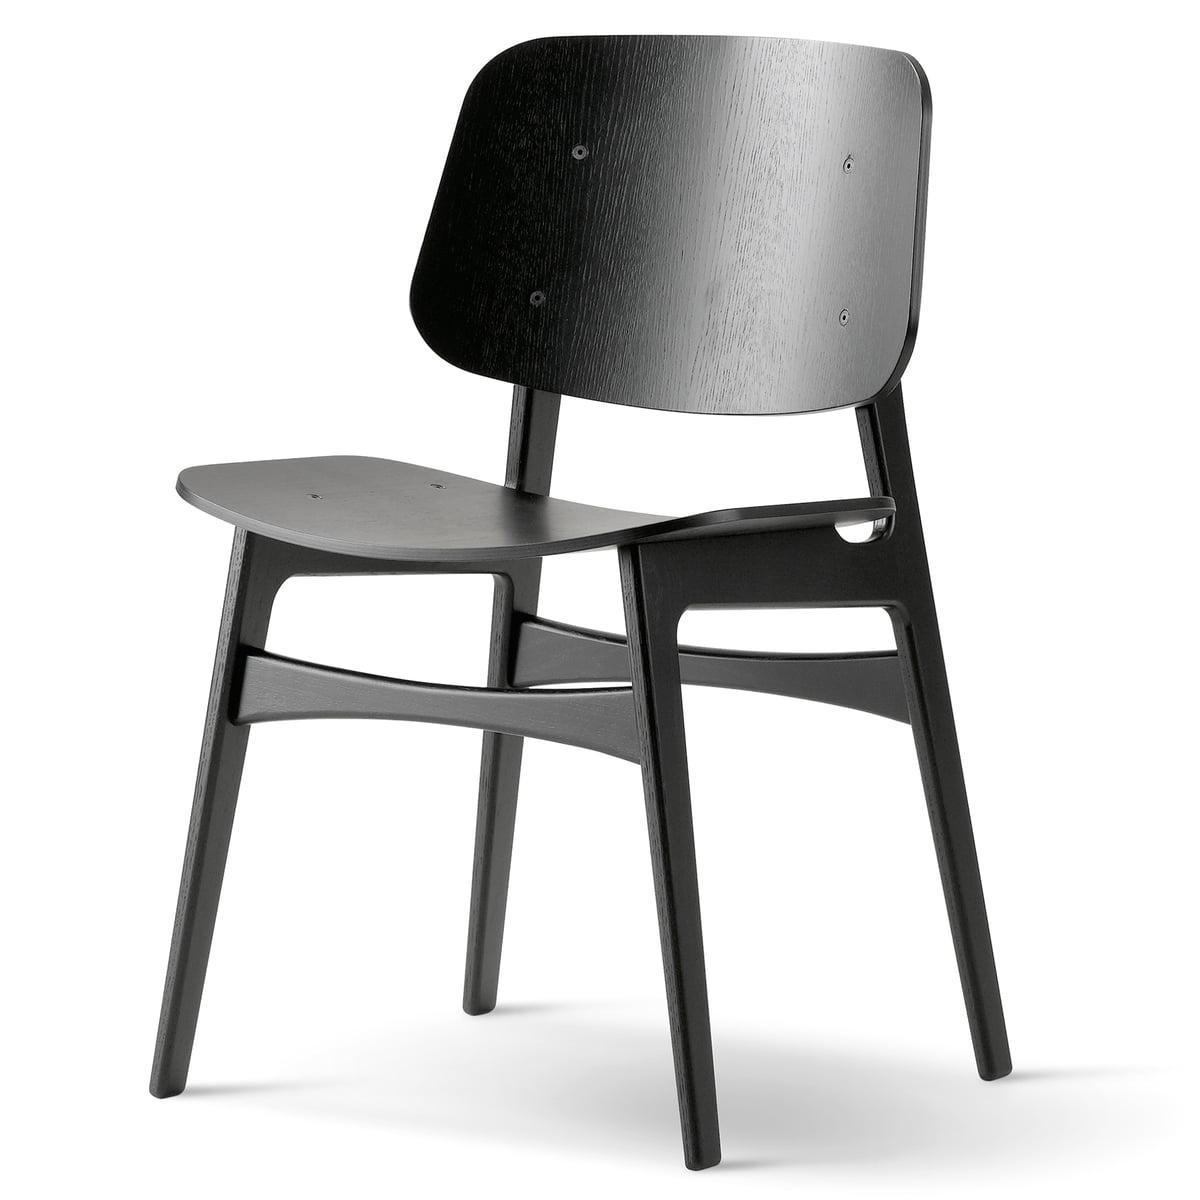 Fredericia Soborg Chair Model 3050 Oak Black Lacquered